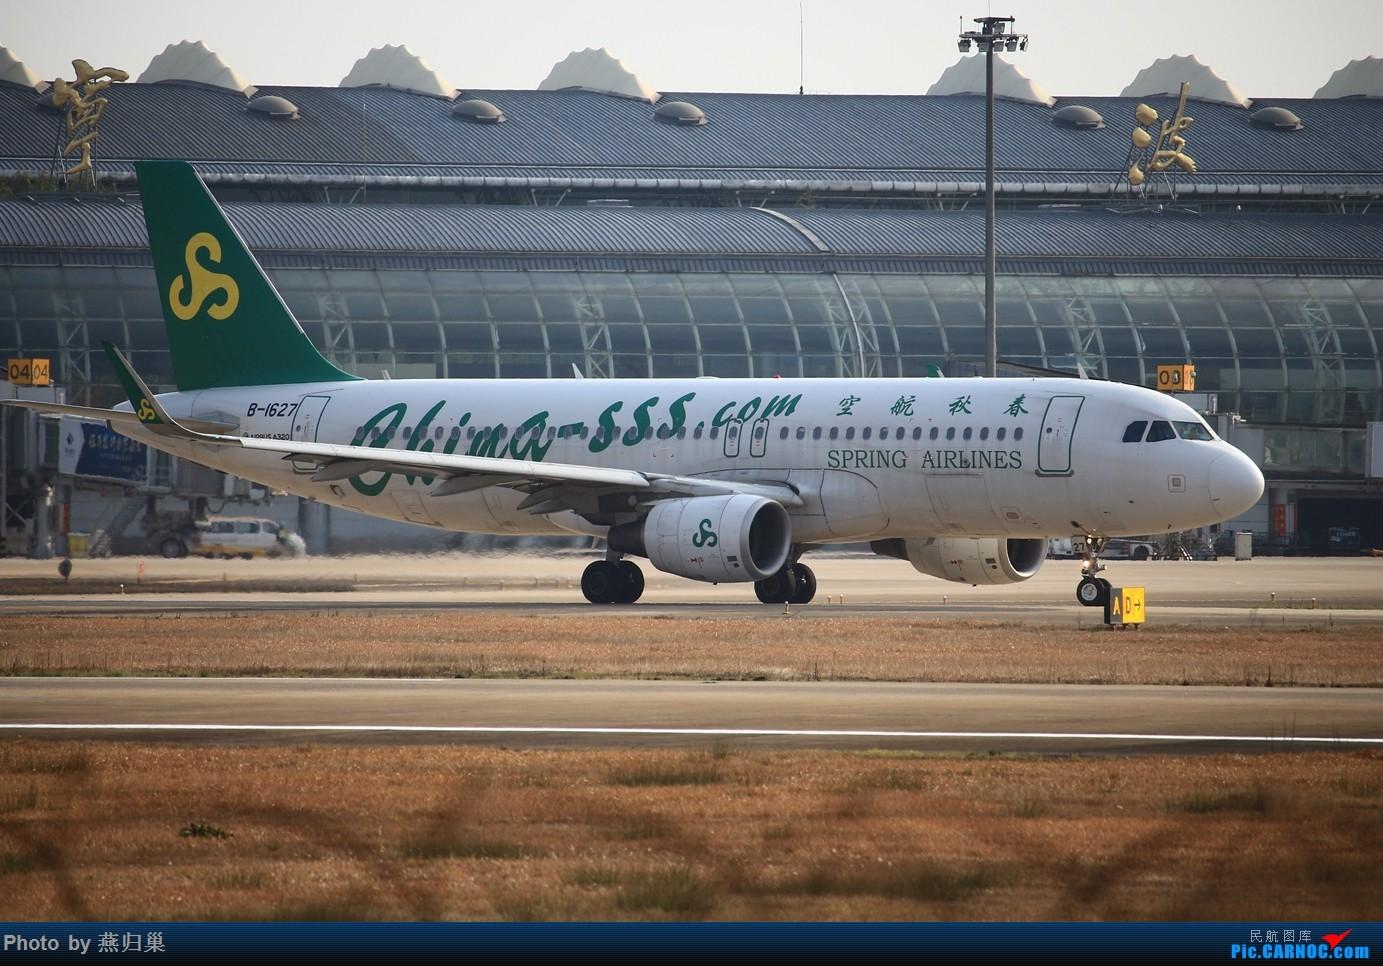 Re:[原创]【宁波飞友会】年前NGB拍机合集 AIRBUS A320-200 B-1627 中国宁波栎社国际机场